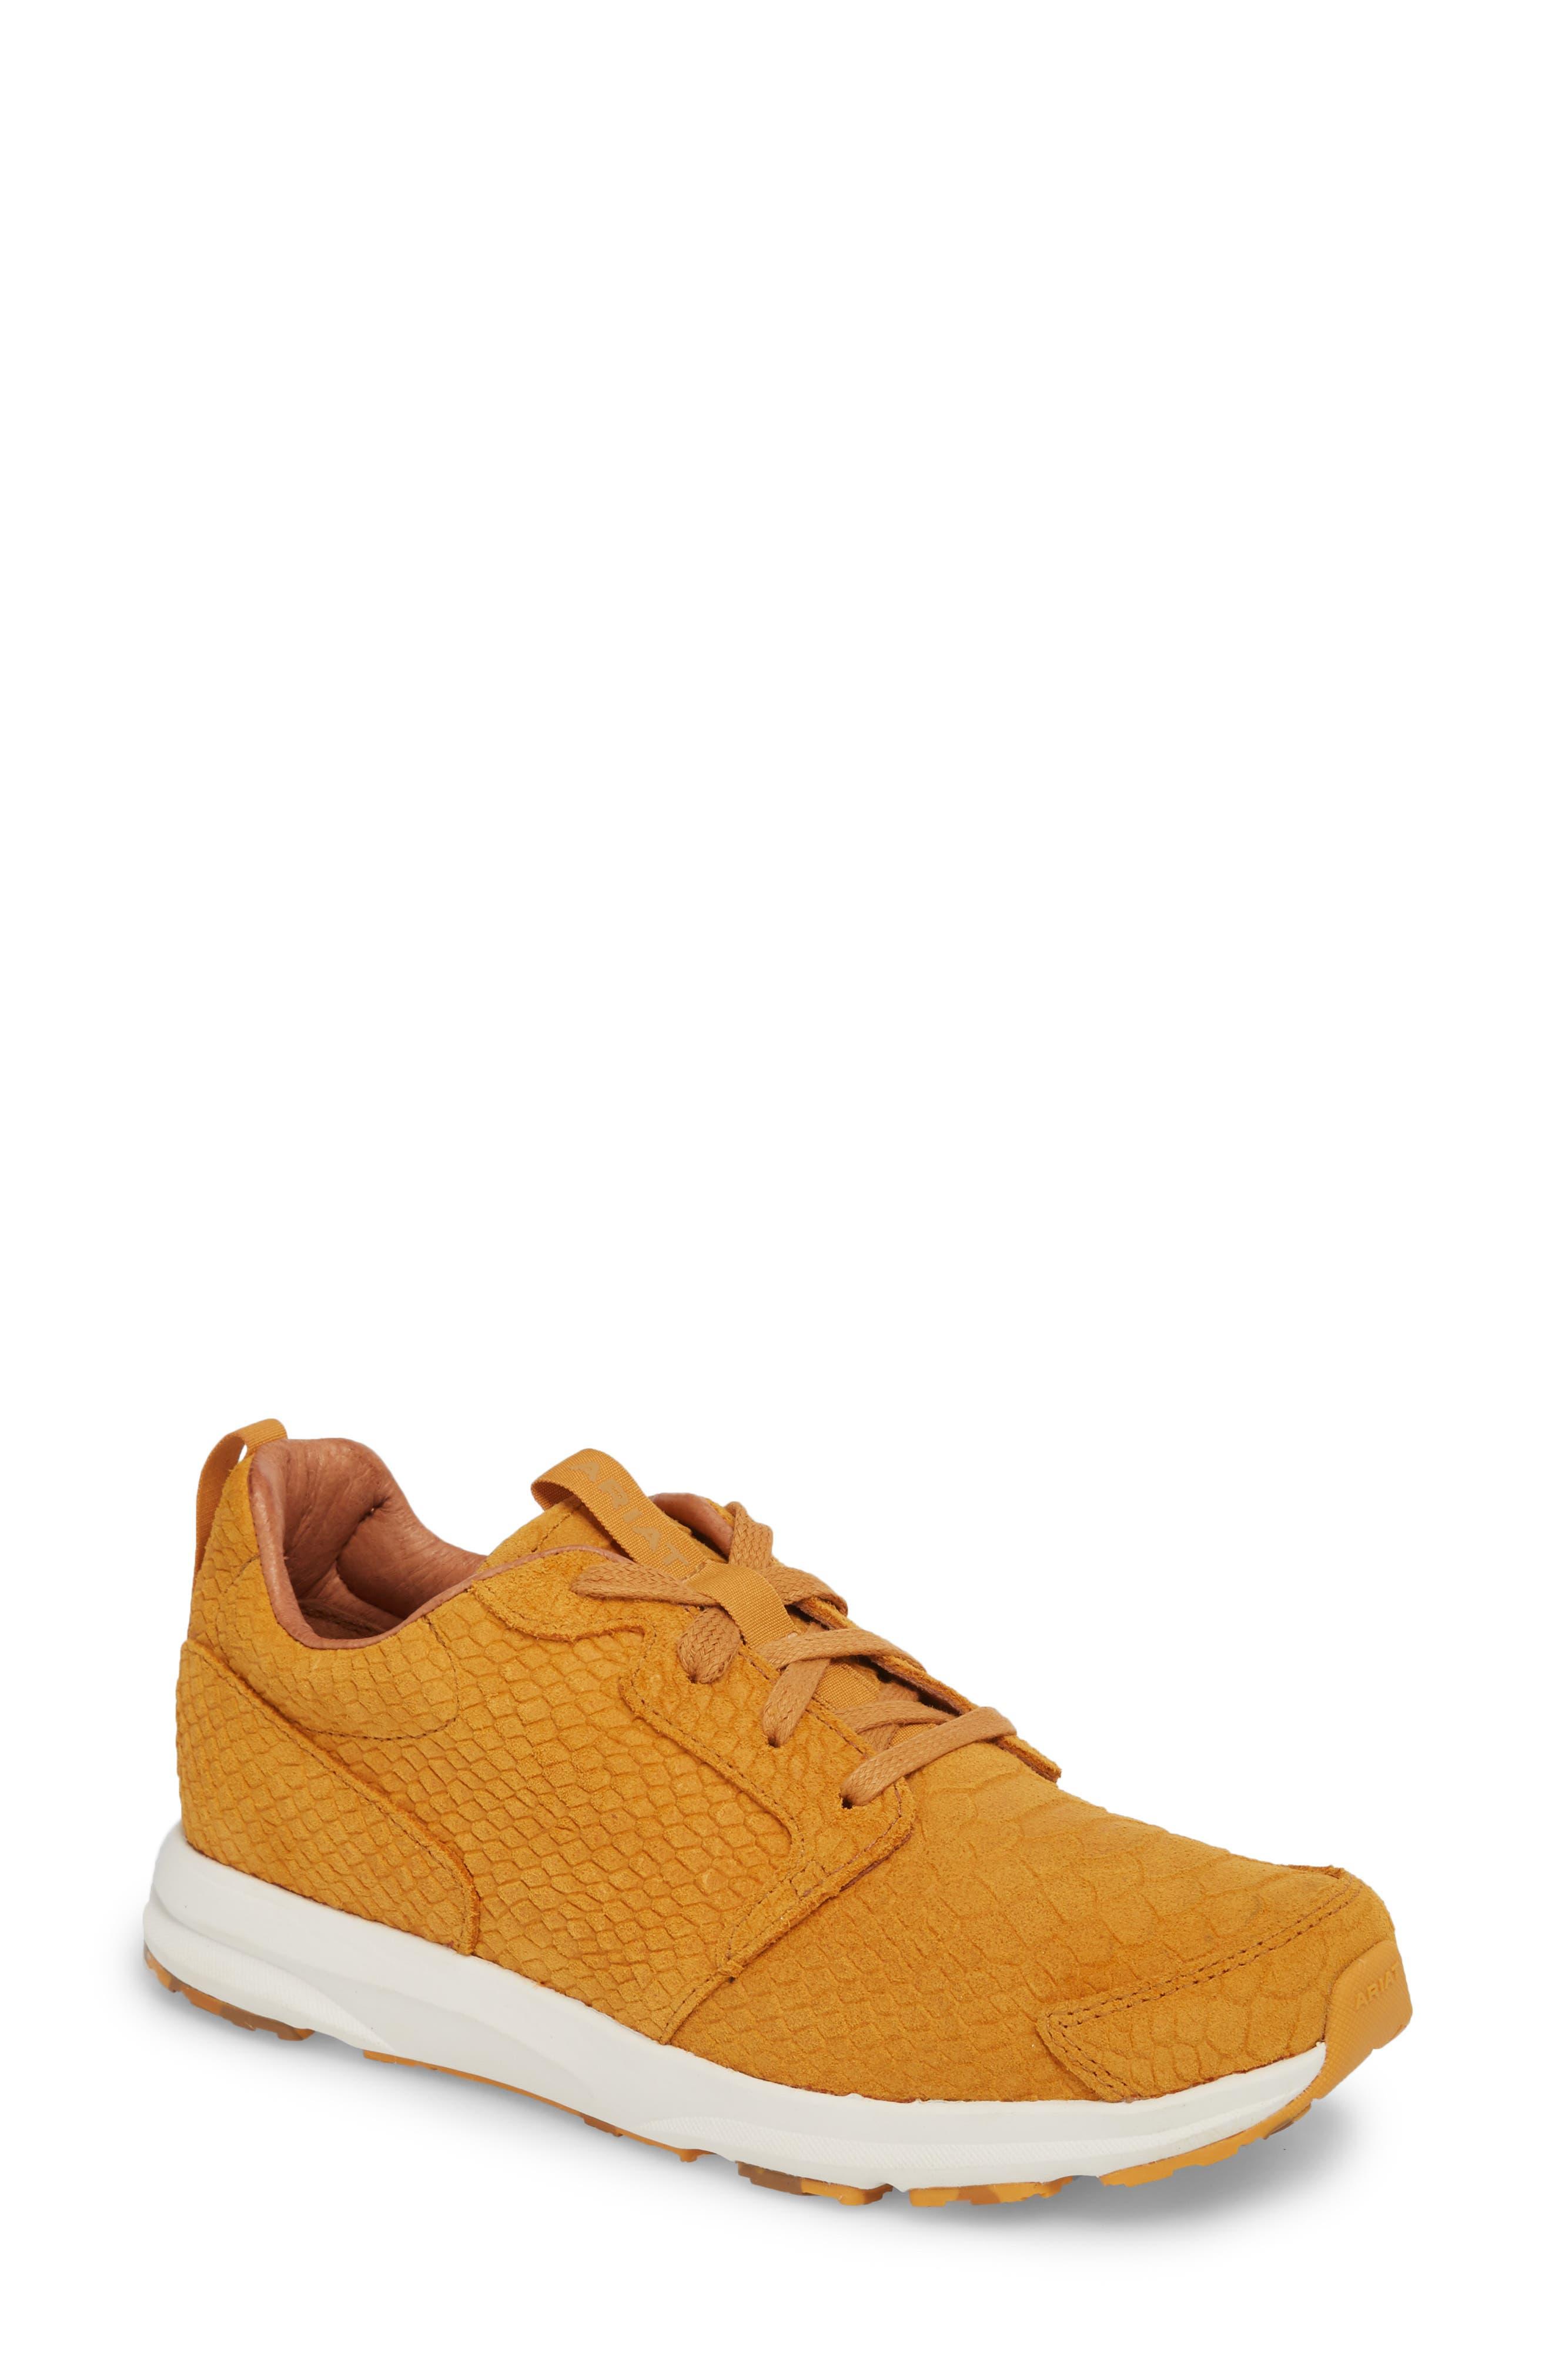 Fusion Sneaker,                             Main thumbnail 1, color,                             Fiery Zilla